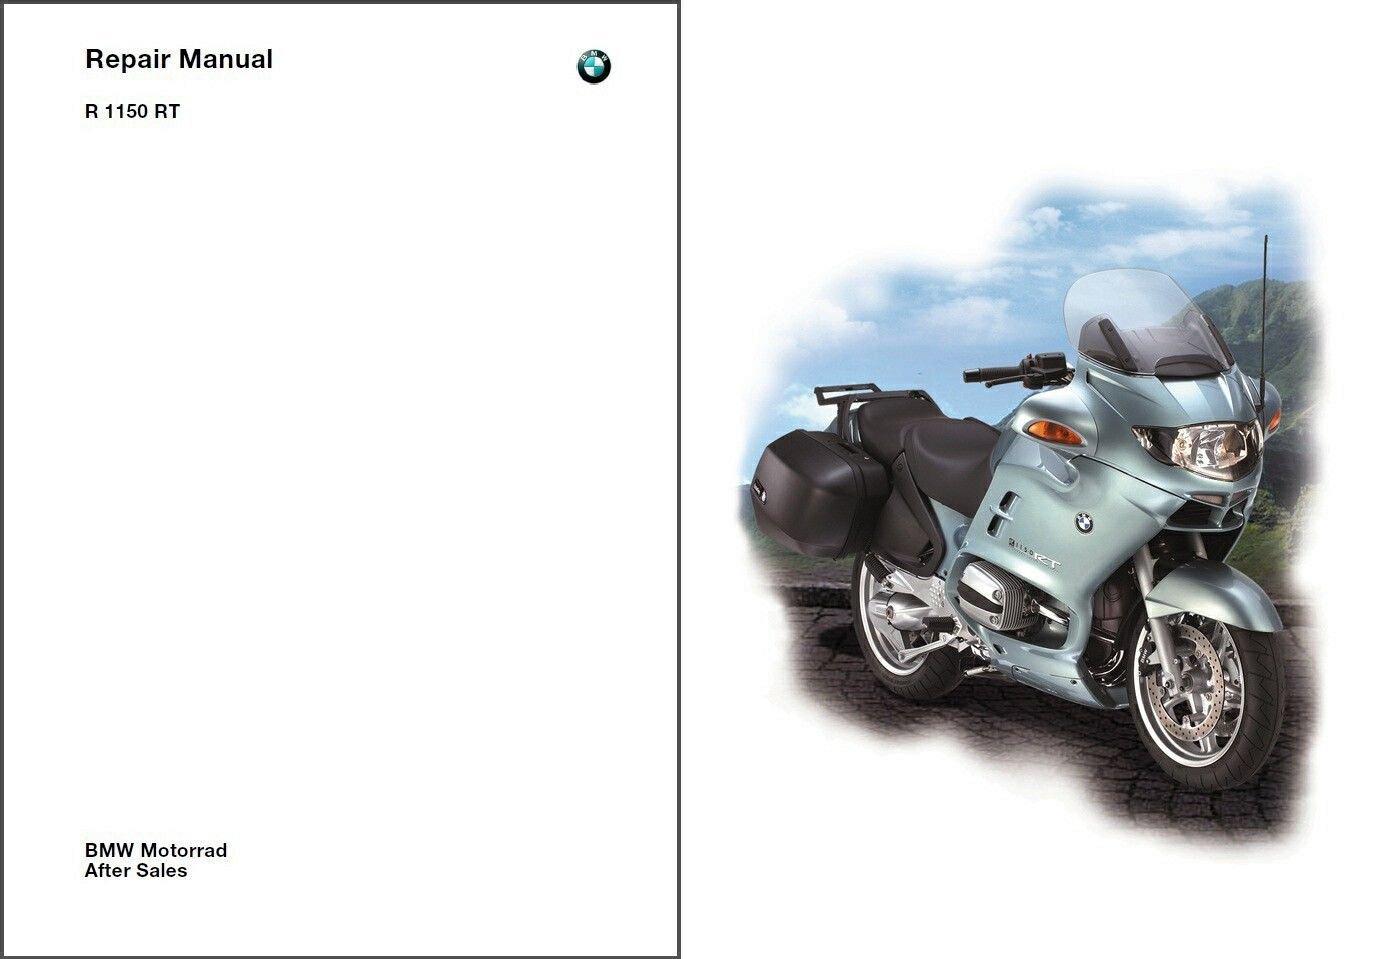 2001 2002 2003 2004 bmw r1150rt service manual cd multilingual for rh unisquare com 2002 bmw r1150rt manual 2002 bmw r1150rt manual pdf